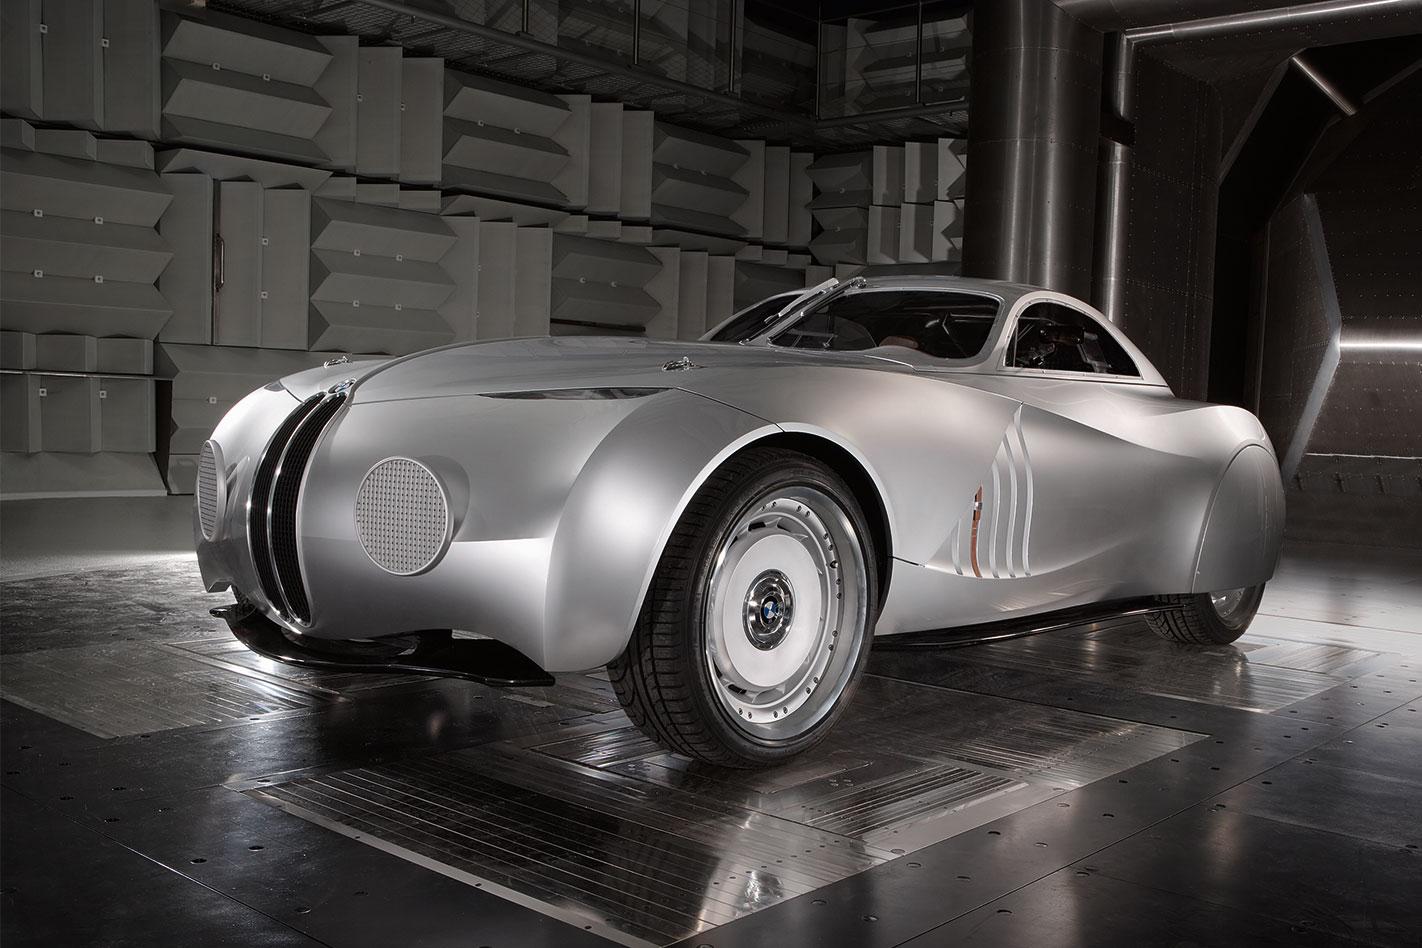 BMW-Mille -Miglia -Hommage -front